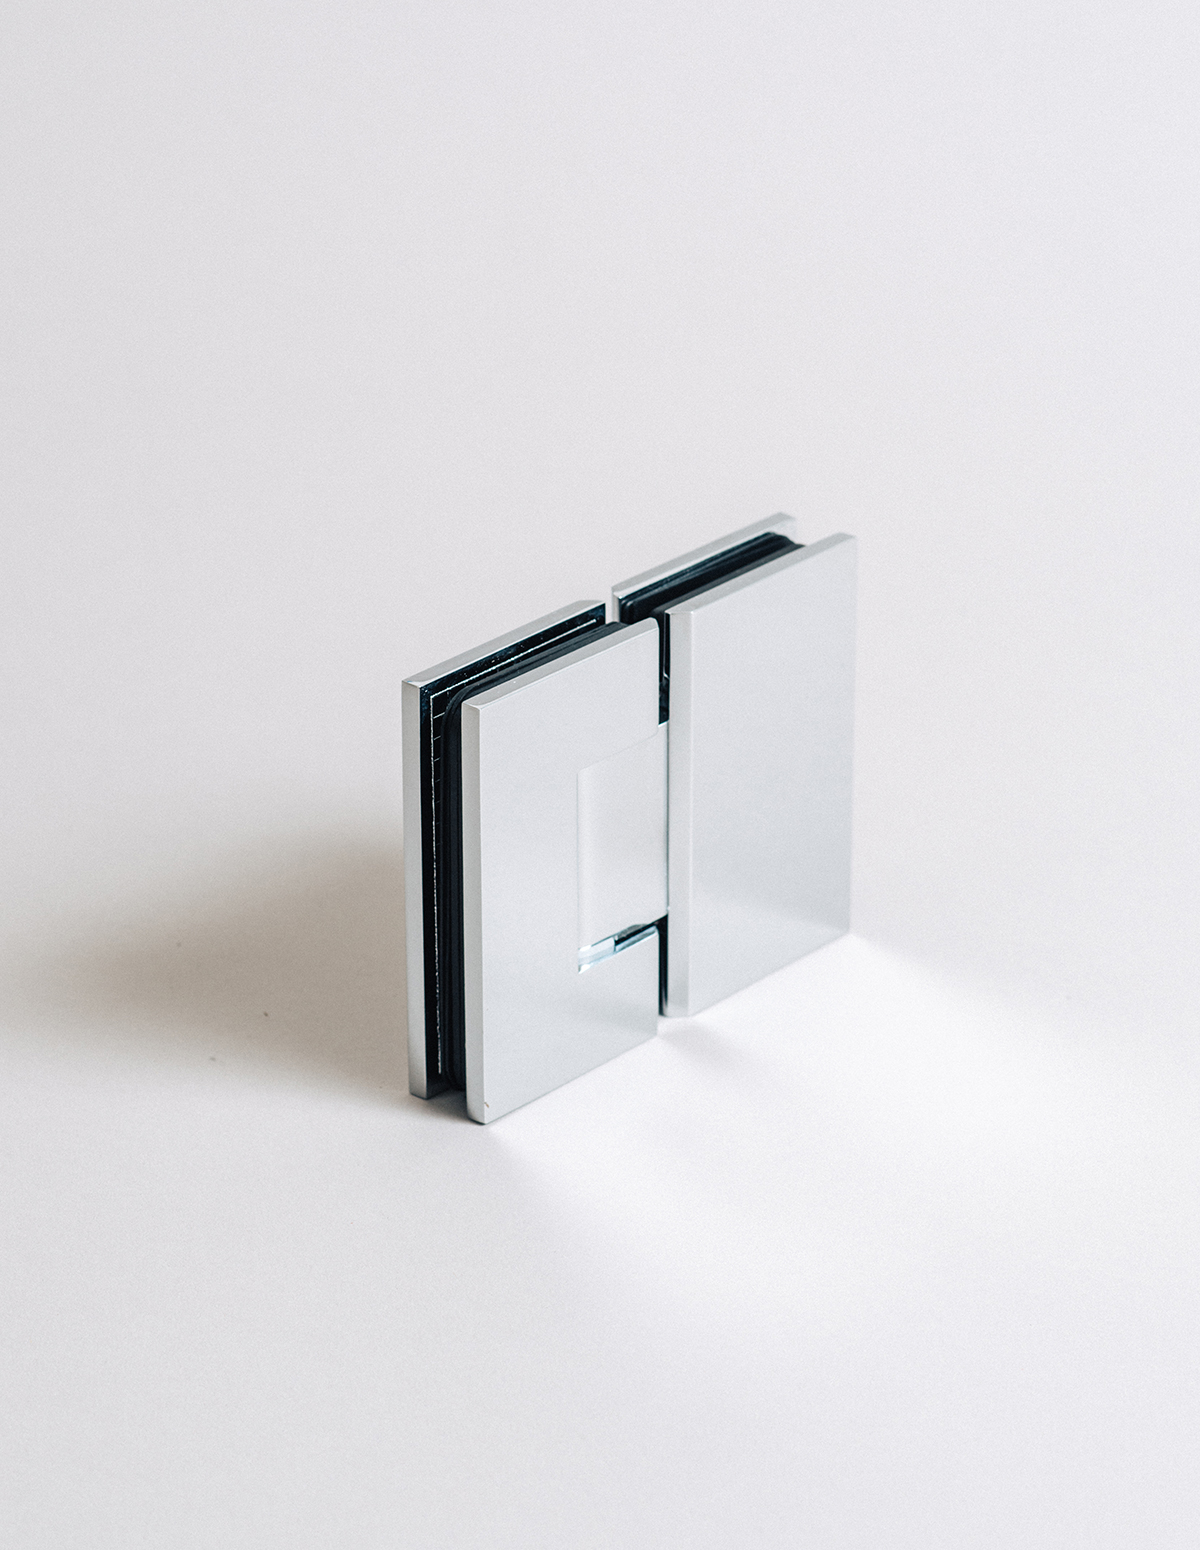 Optimum-Studios-Architectural-Glass-Metal-HardwarePage-Hinge4-042216